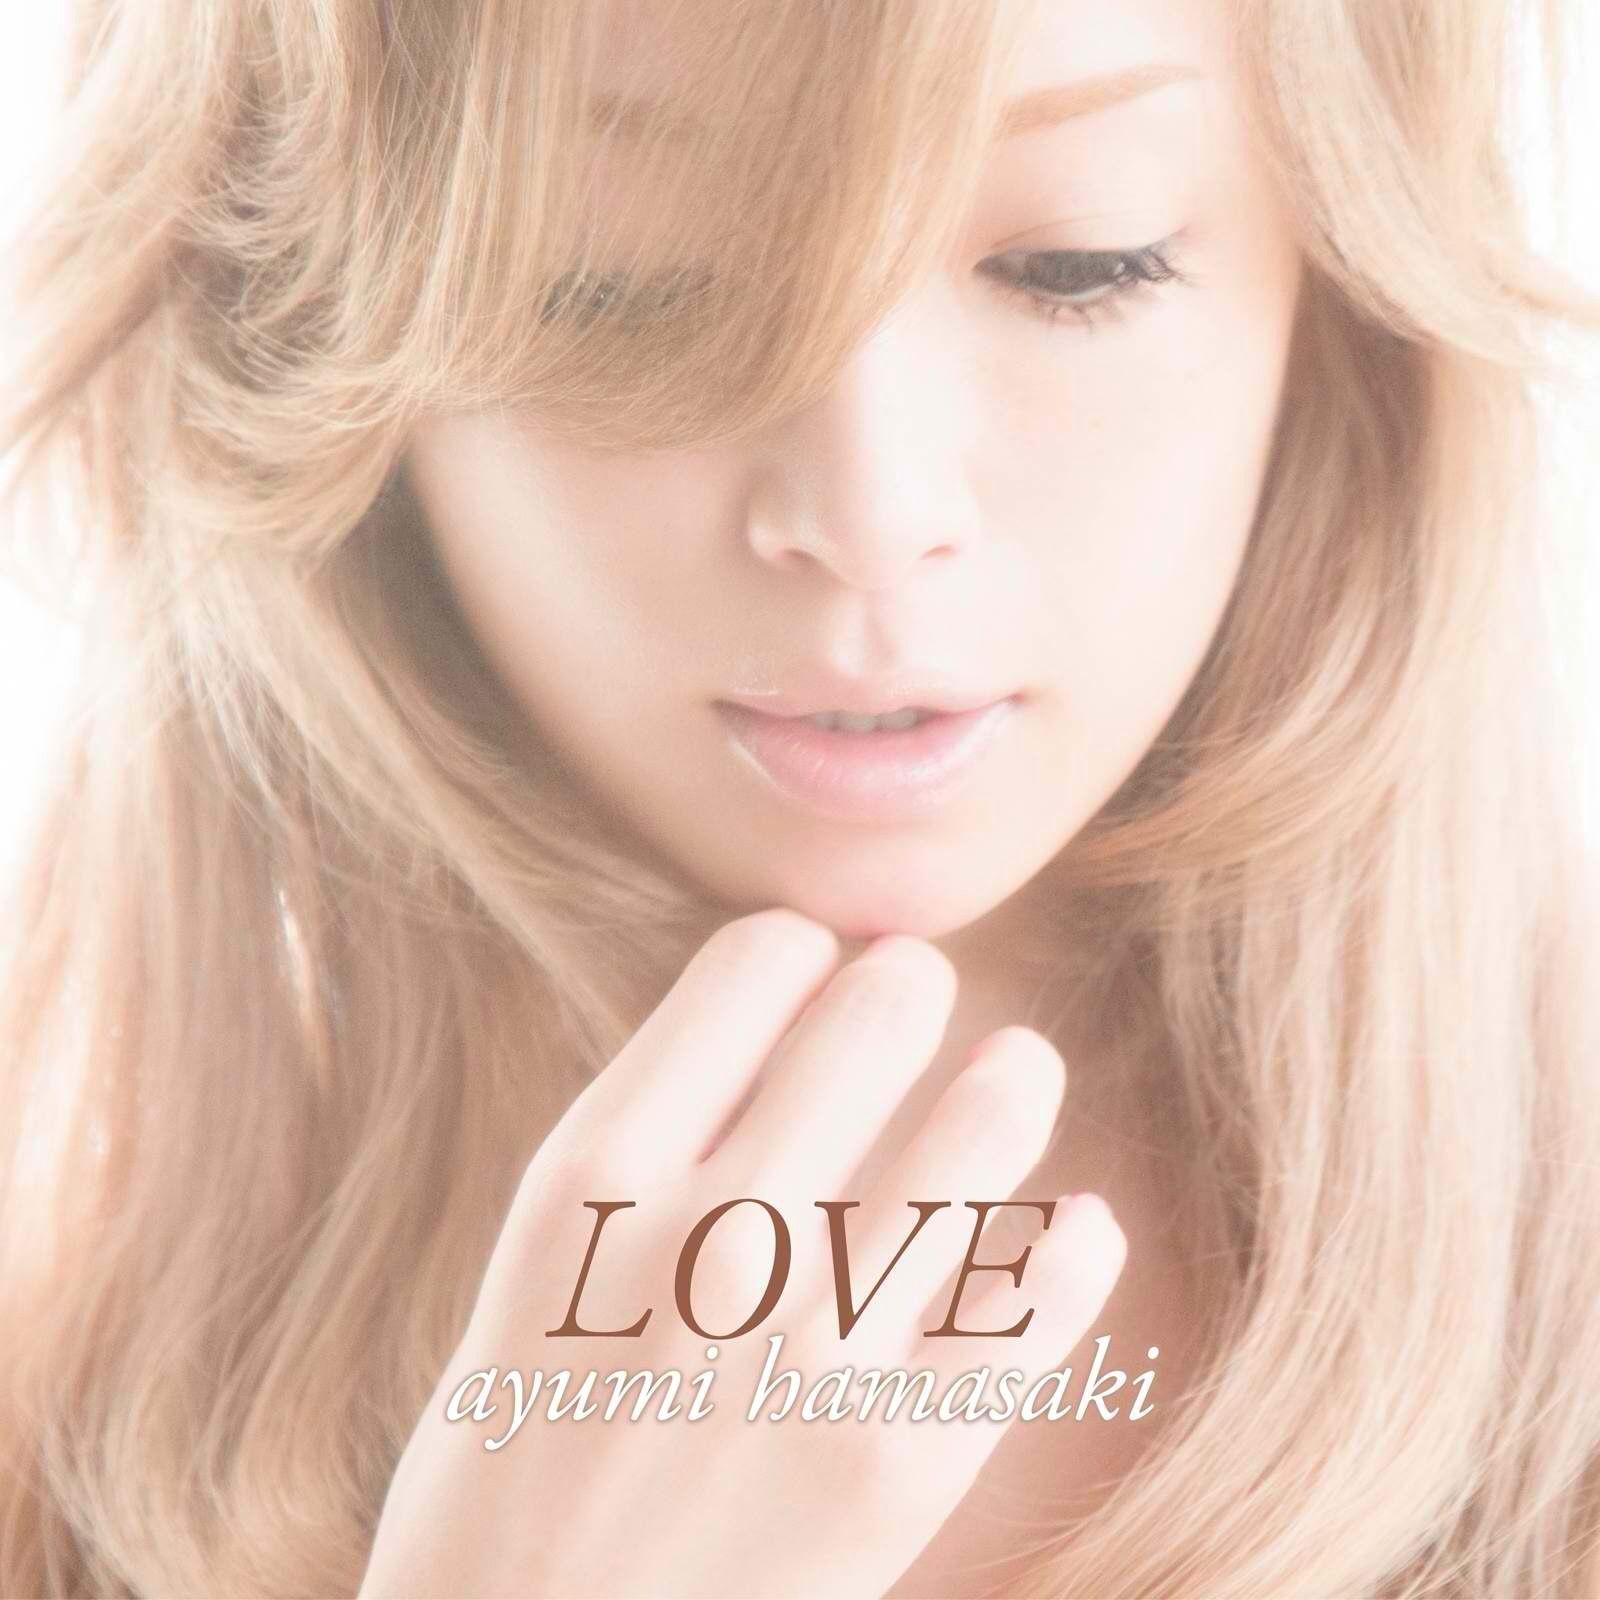 Mini Album LOVE (2012)(画像あり) 浜崎あゆみ, ミニアルバム, 浜崎